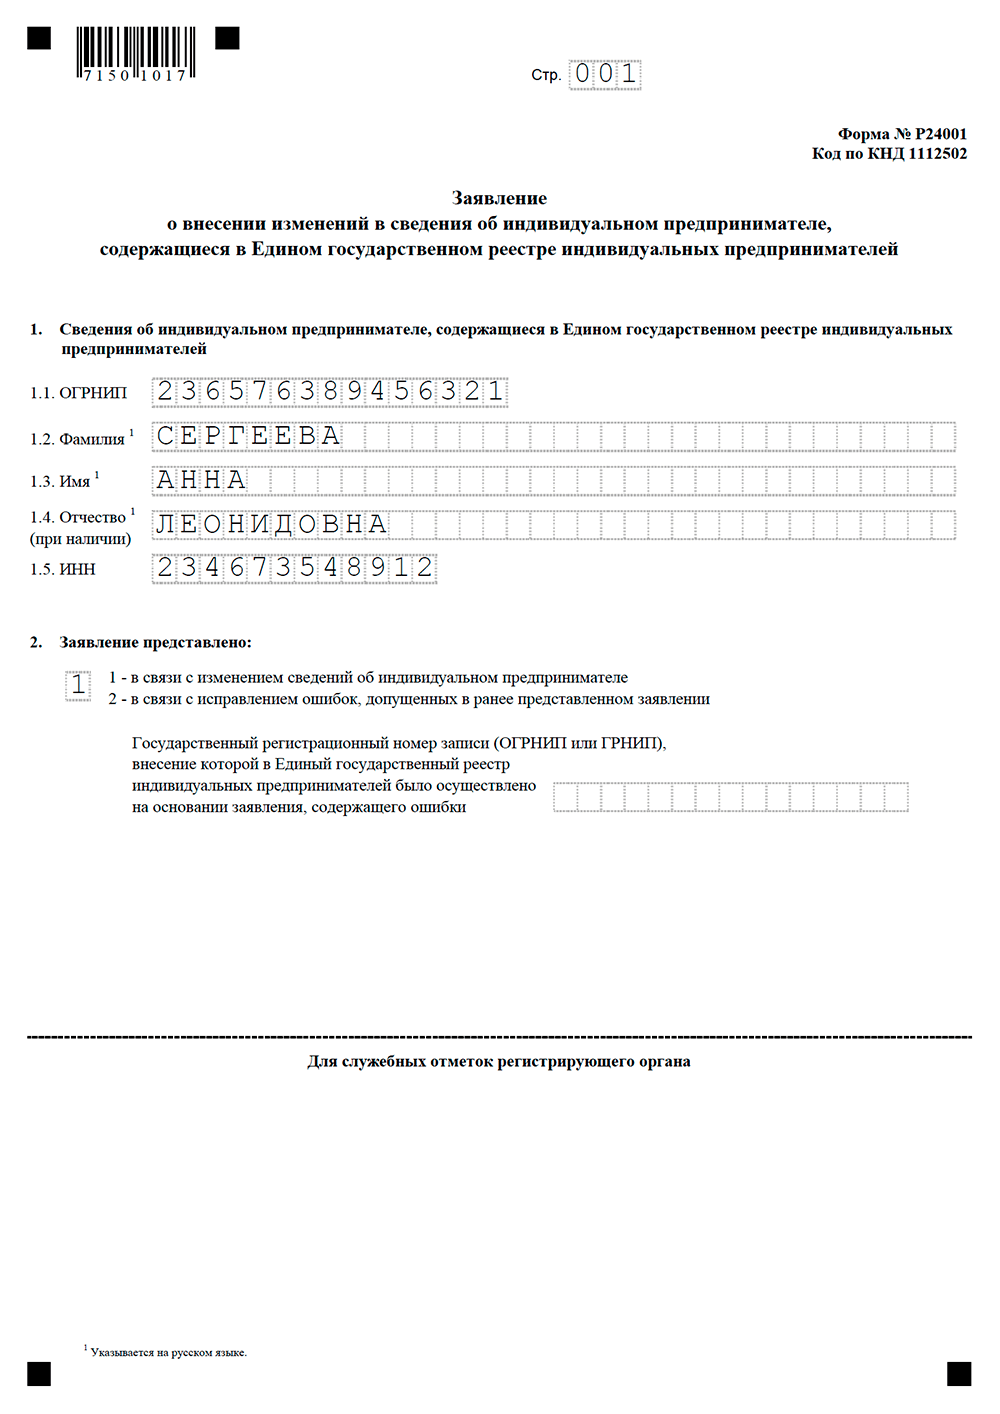 сроки регистрации ооо в пфр